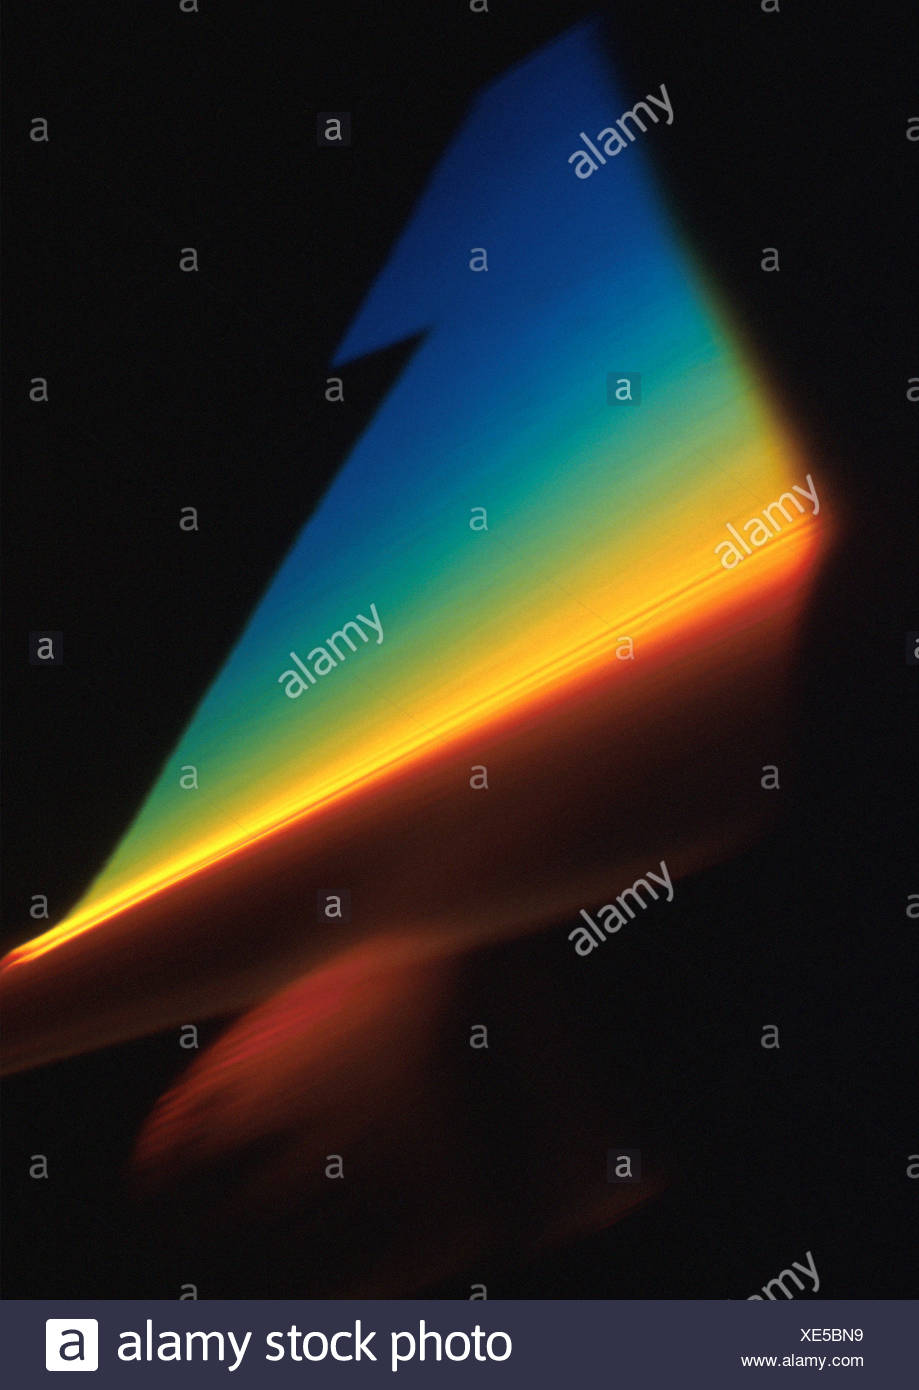 Light effect, triangular, rainbow colors. - Stock Image